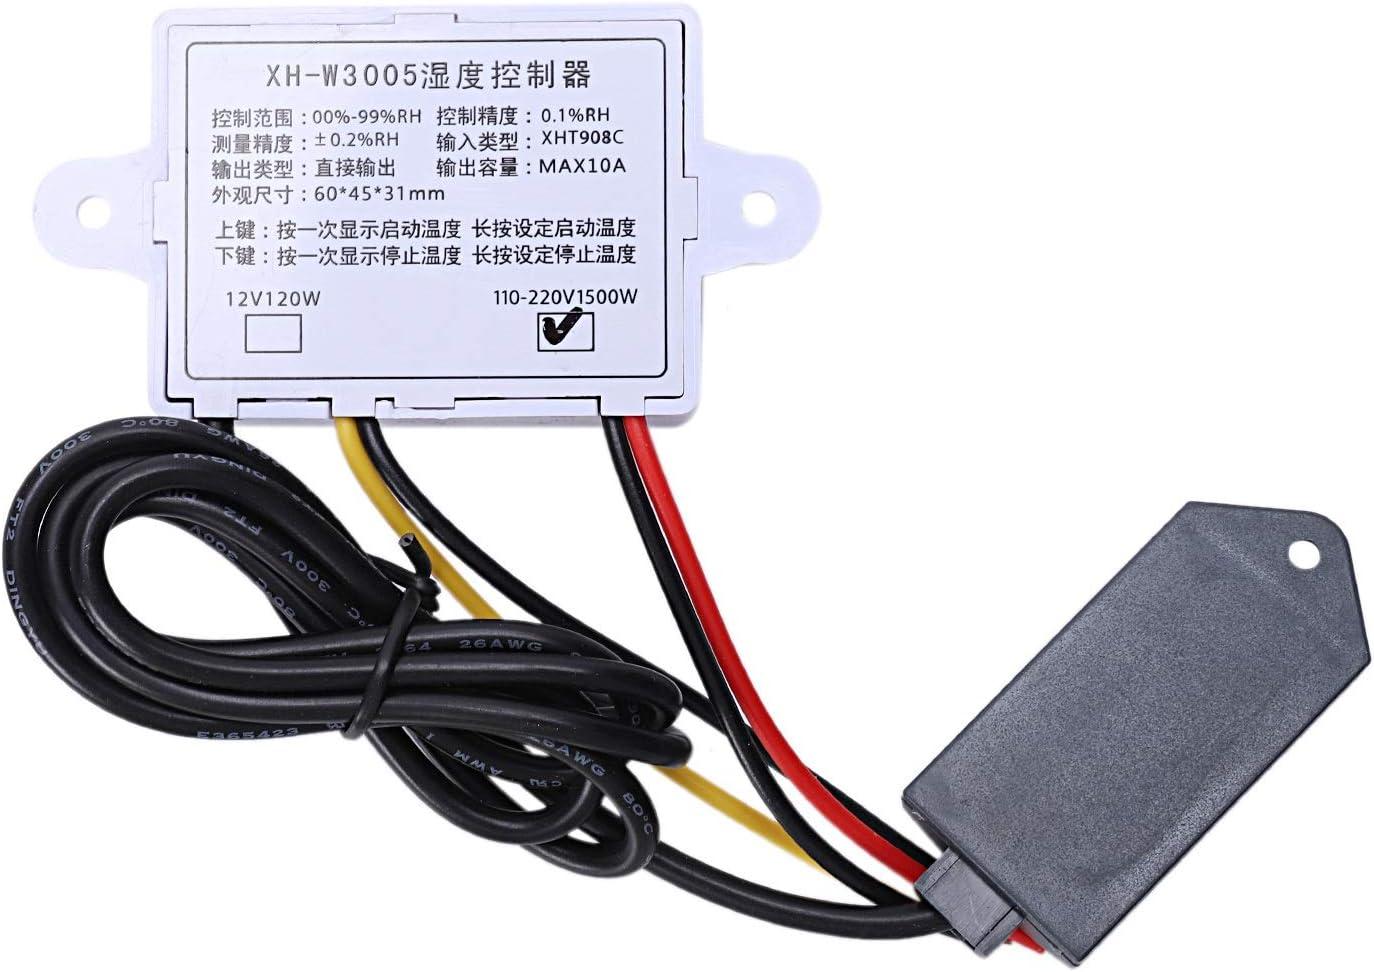 Senmubery Hygrometer Feuchte Regler F/ür Digitale Feuchte Regler 0-99/% Rh Hygrostat Mit Feuchte Sensor AC220V